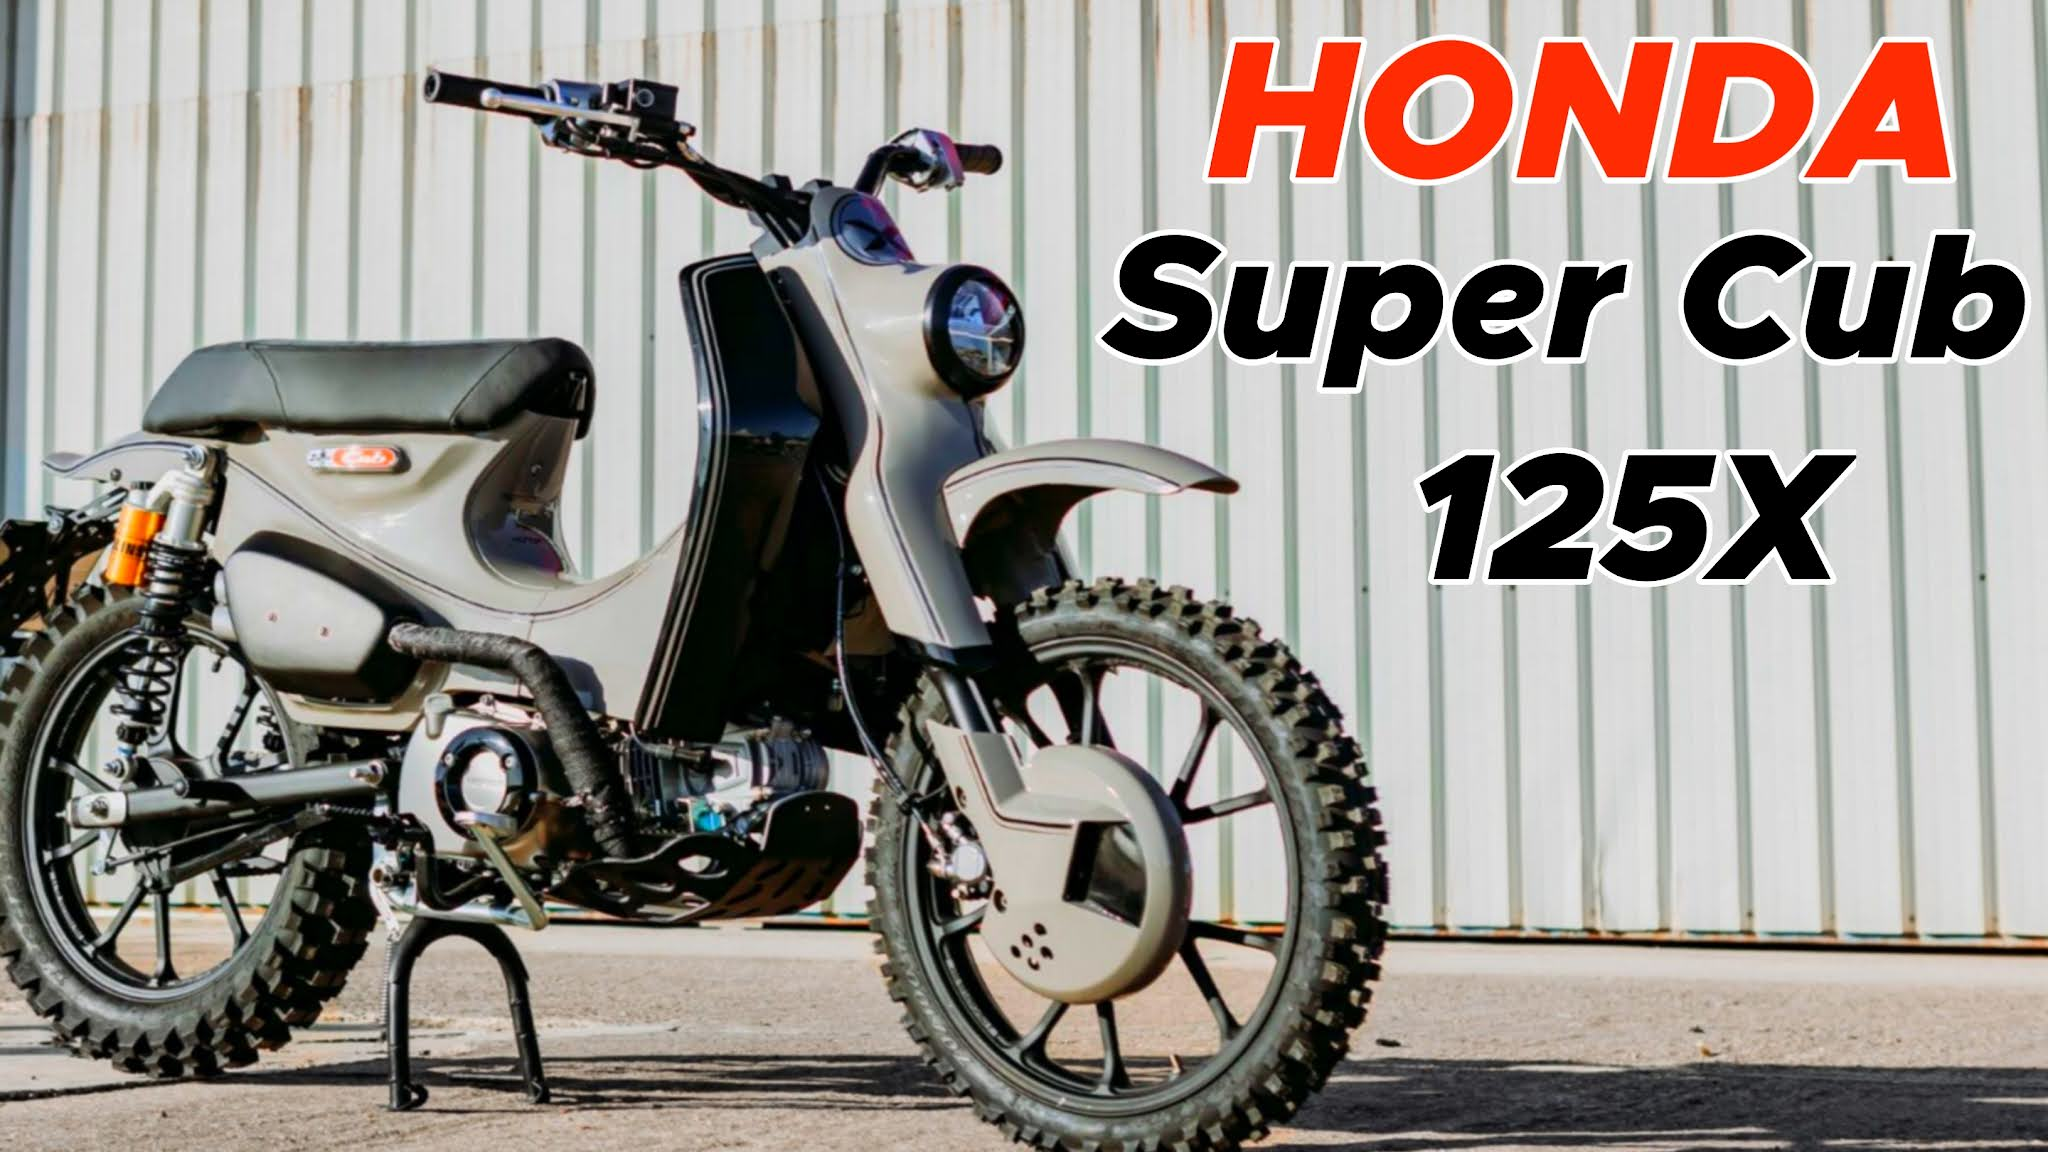 Honda Super Cub 125x,Super Cub 125X,New,Announced,Honda,e MAAN Motocicli,Audaci presentano il,Honda Super Cub 125,Honda Super Cub 125X,2021,2022,Super Cub,125cc,125X,nova super cub 125x,honda super cub 125x,motos honda,novidades honda,supercub 125x 2022,motos honda no brasil,lançamentos honda